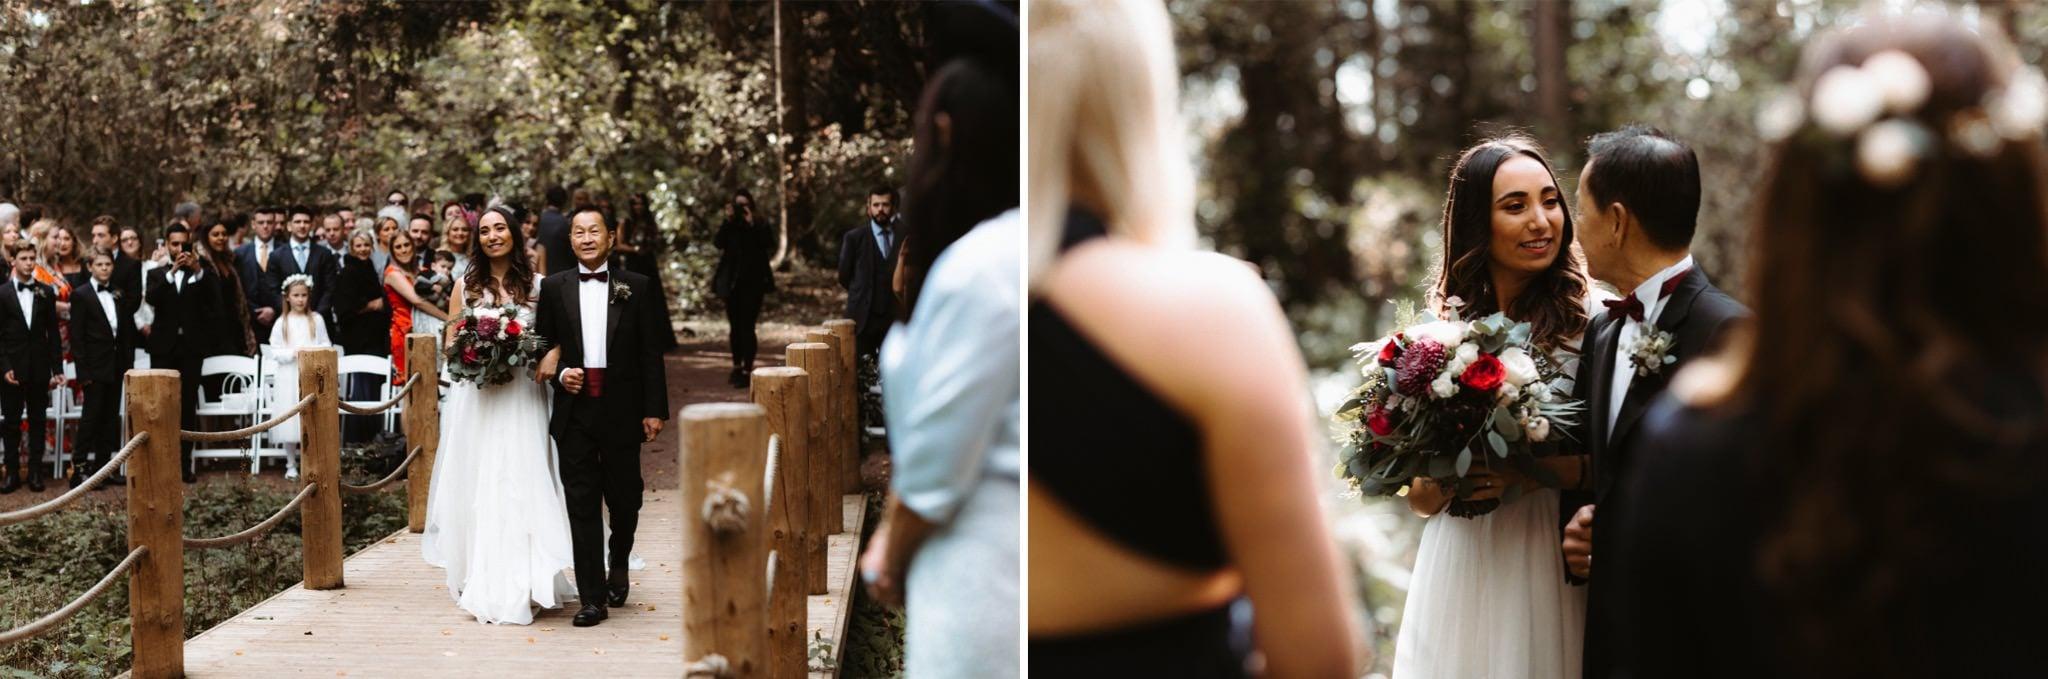 southern california wedding photographer 066